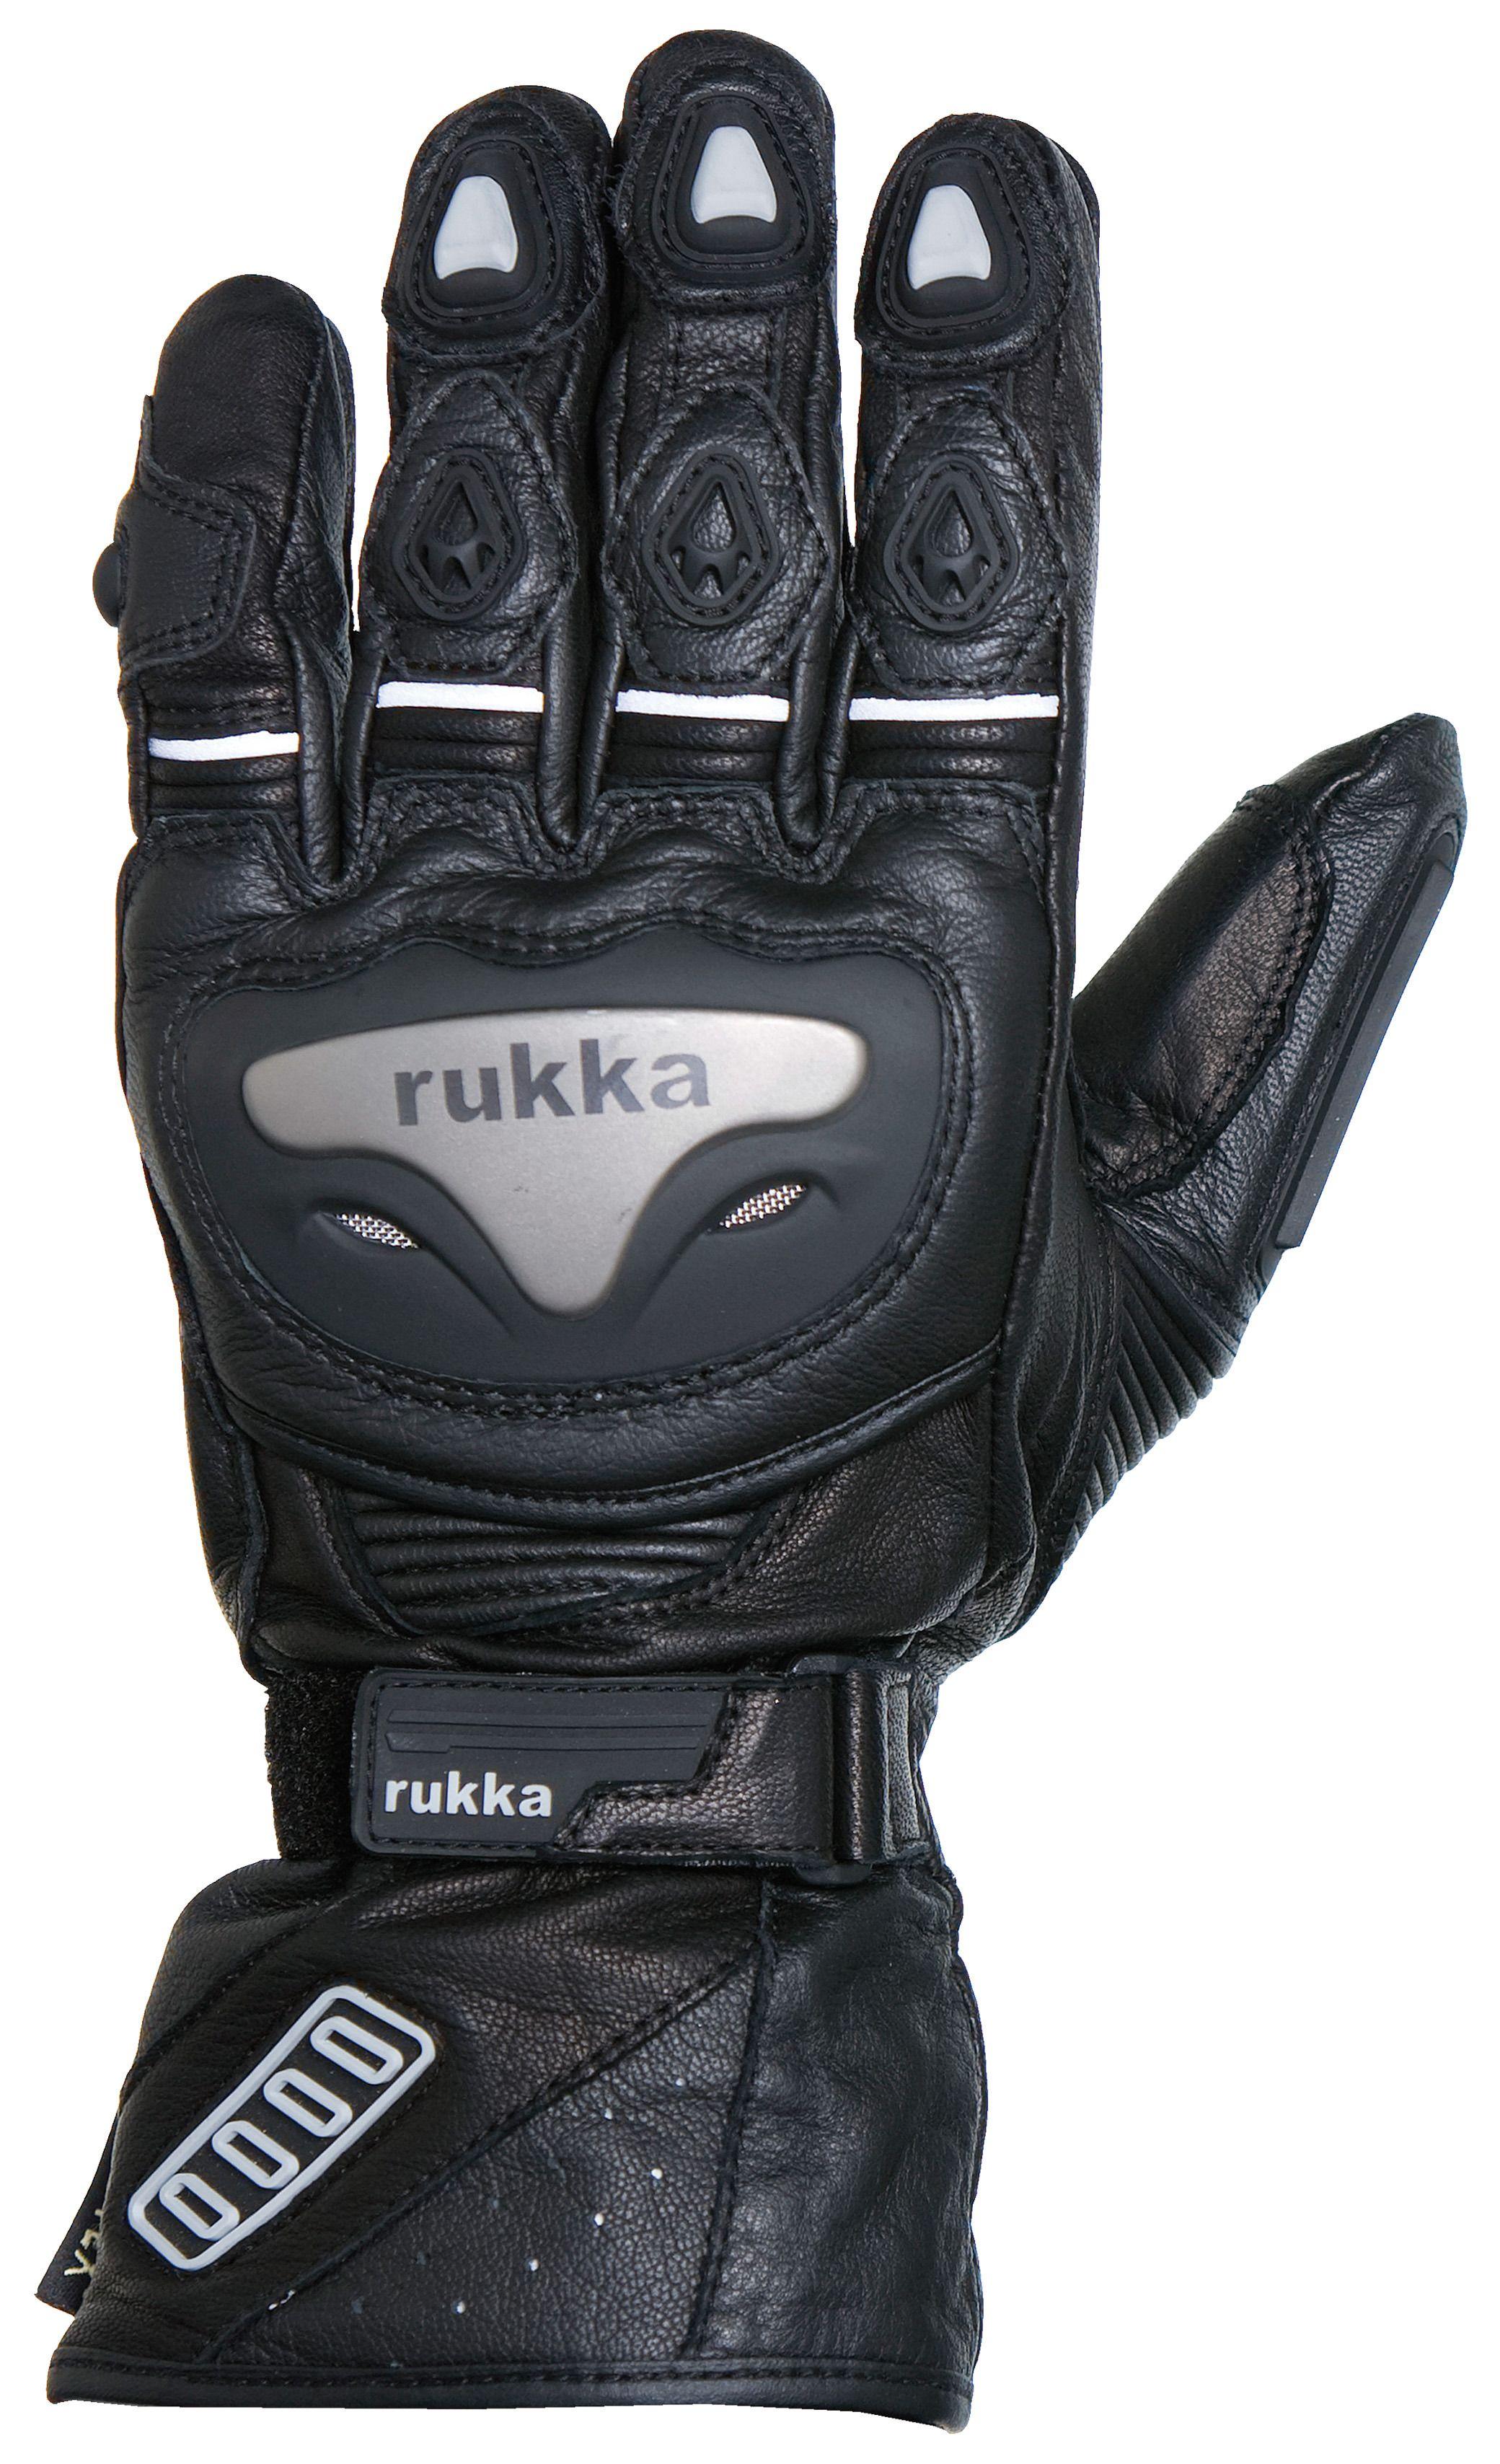 Xtrafit motorcycle gloves - Xtrafit Motorcycle Gloves 23